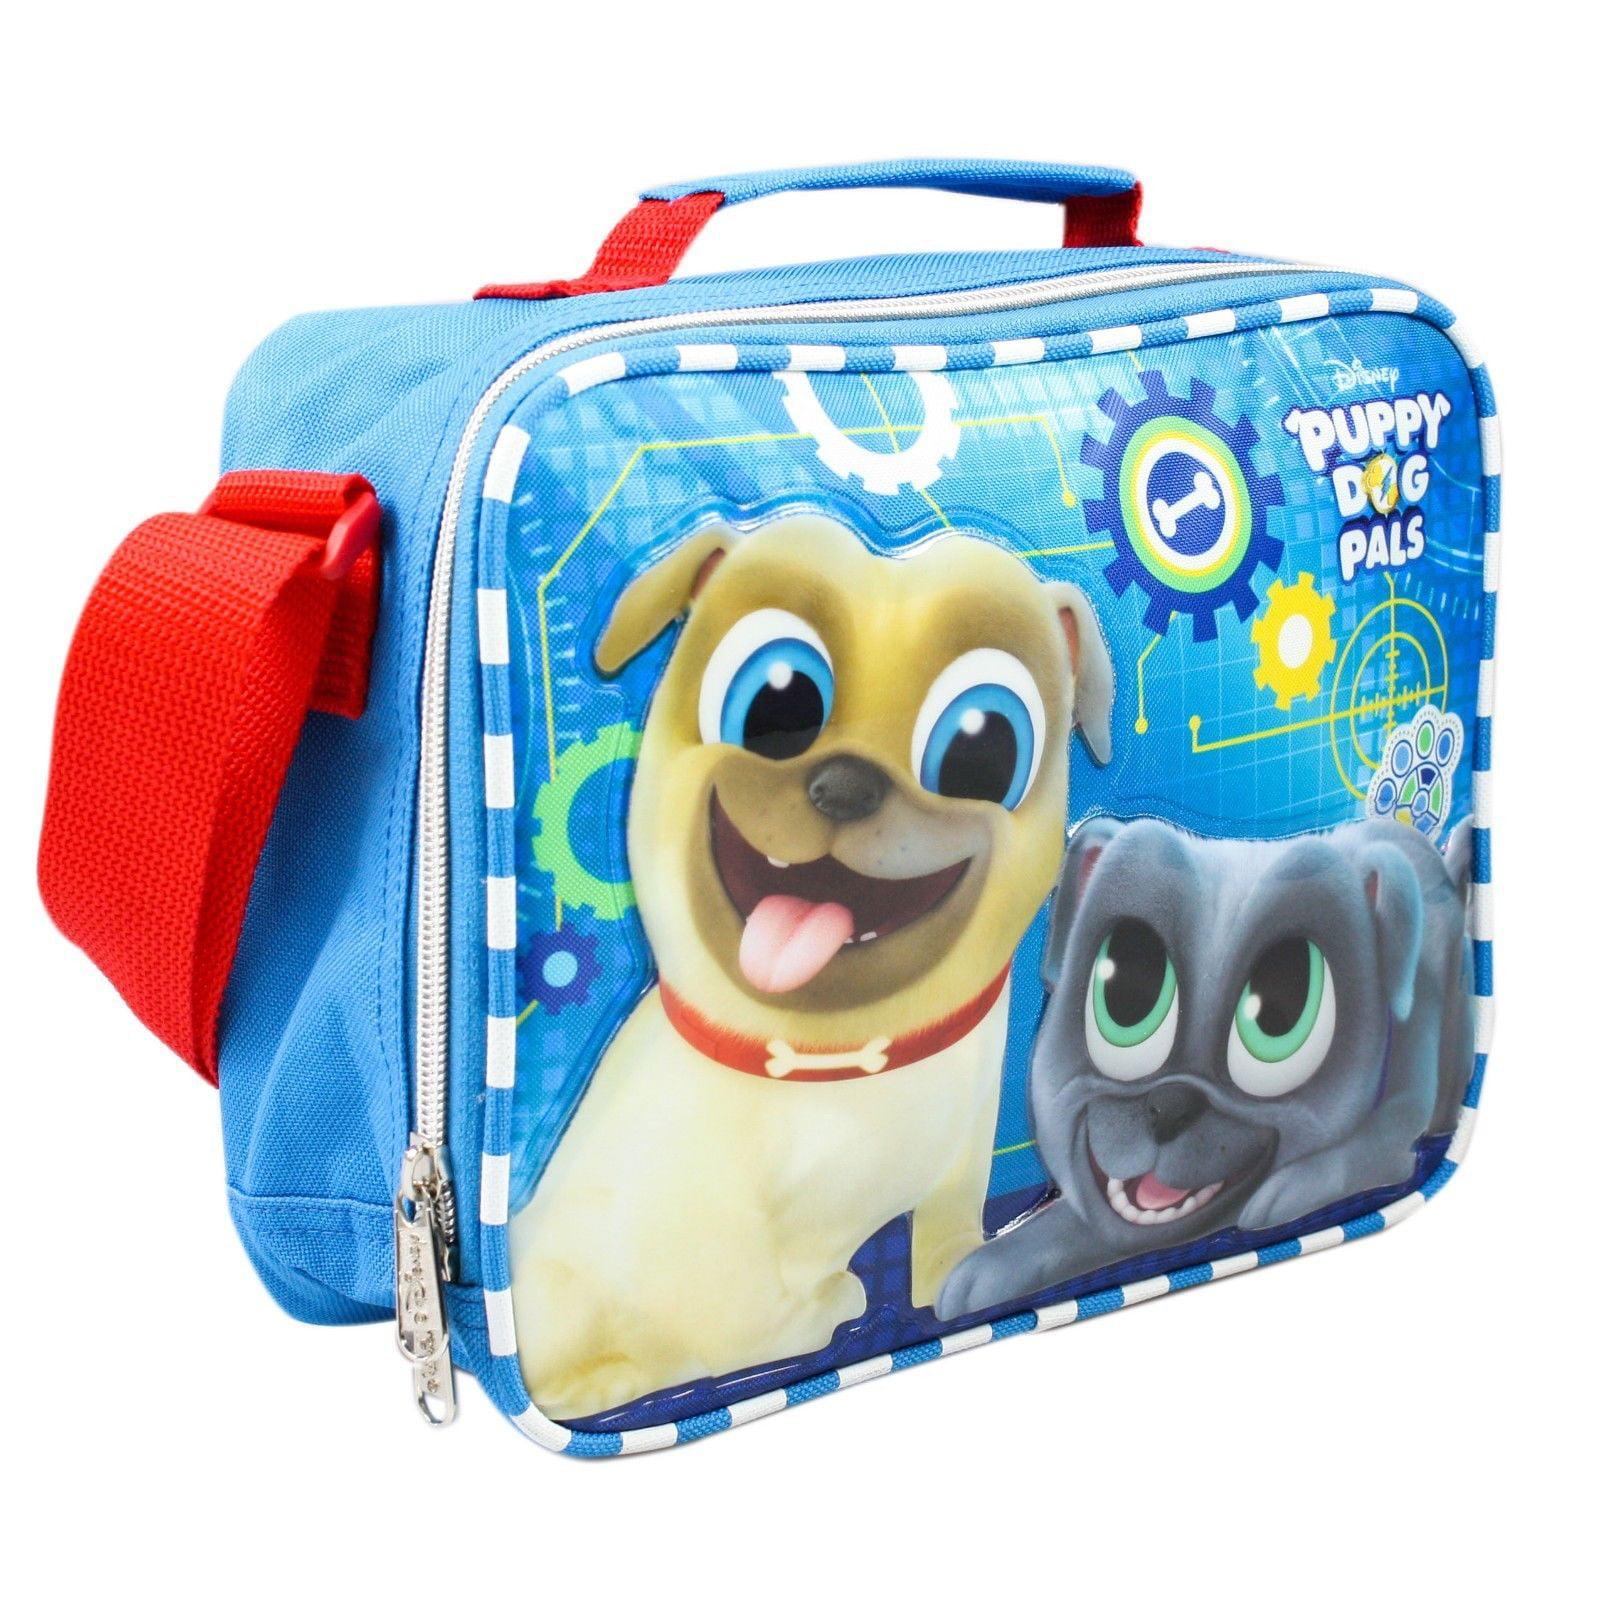 Disney Puppy Dog Pals Insulated Blue Lunch Bag- Bingo & Rolly